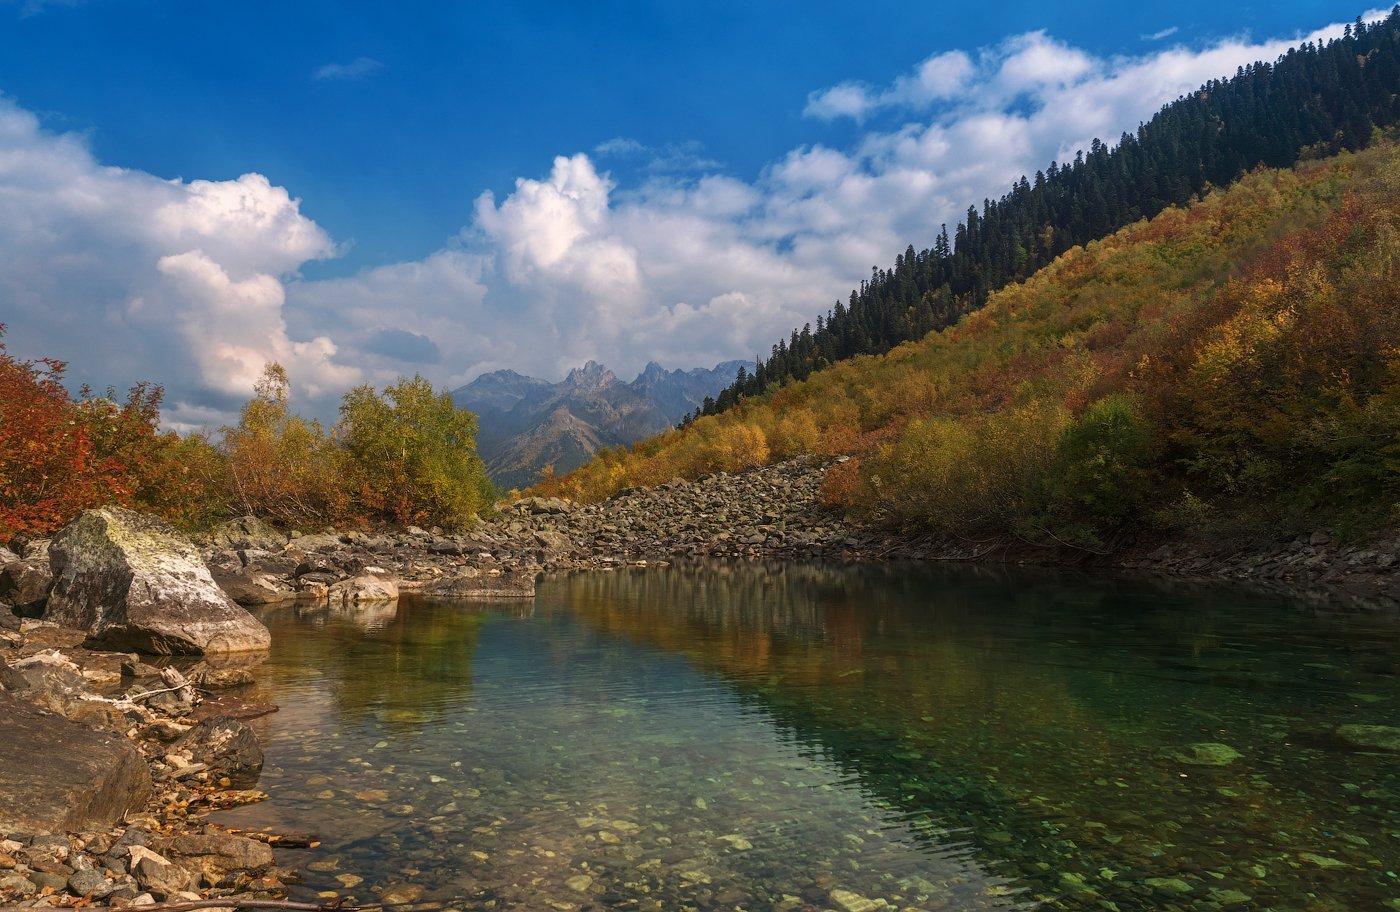 Autumn, Caucasus, Clouds, Бадукское, Кавказ, Карачаево-черкесия, Облака, Озеро, Осень, Теберда, Игорь Подобаев